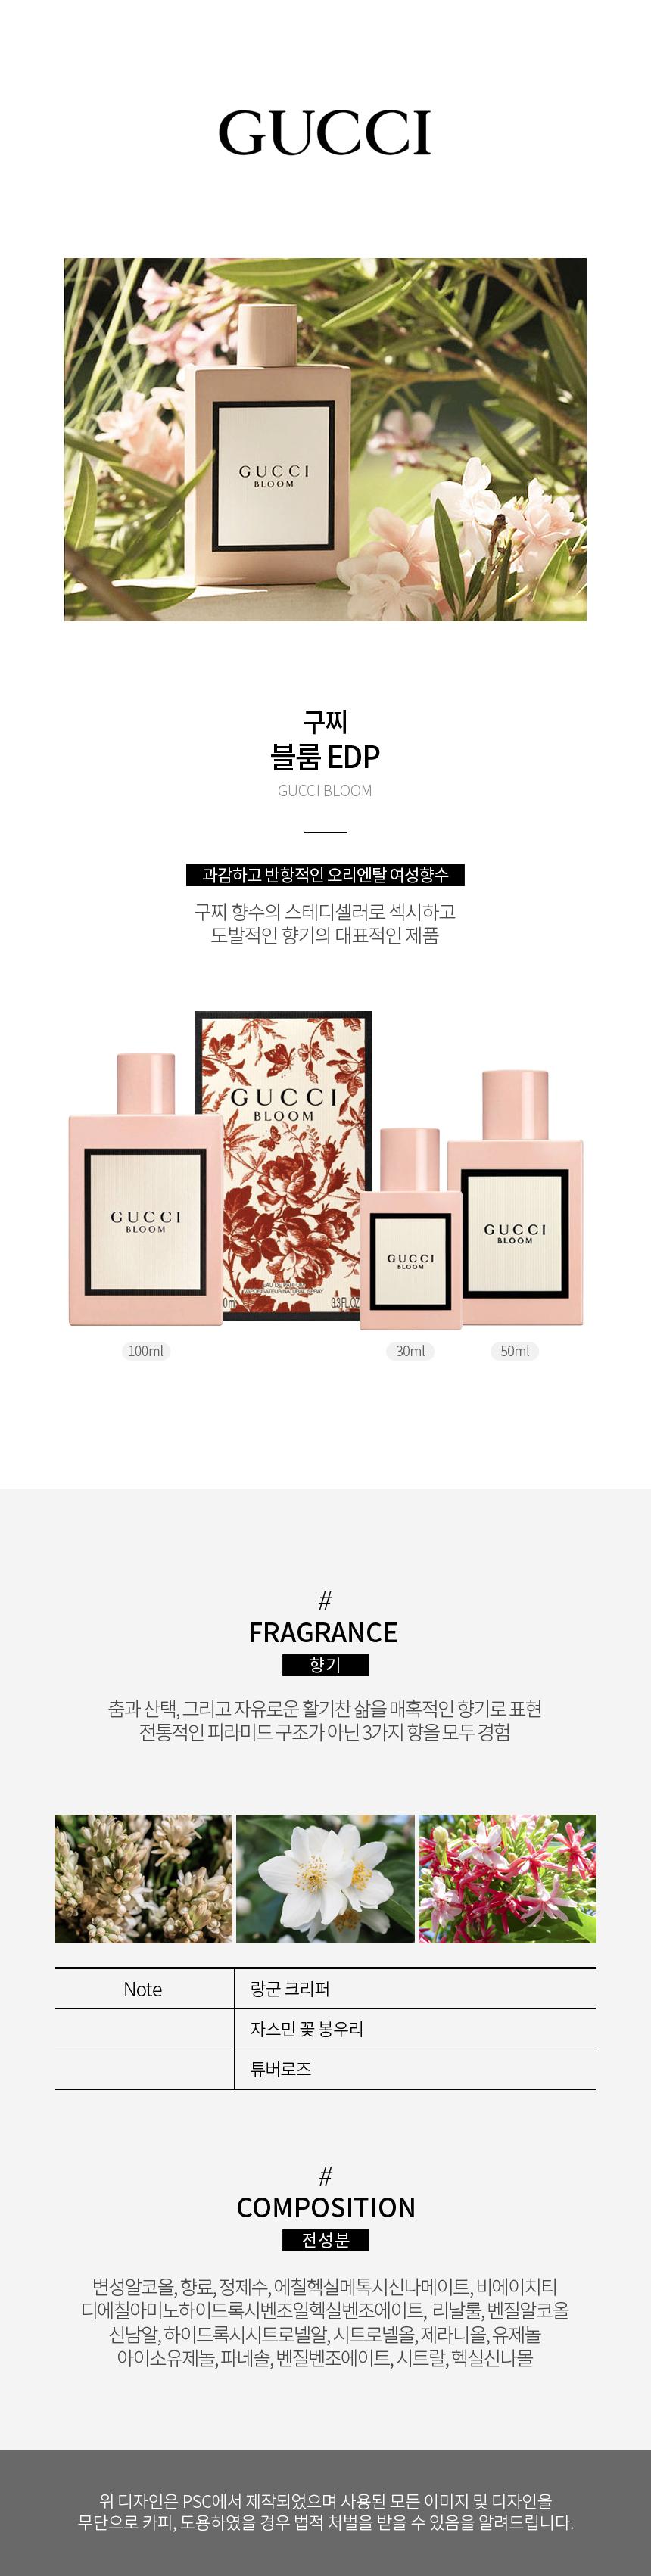 gucci_bloom_page.jpg